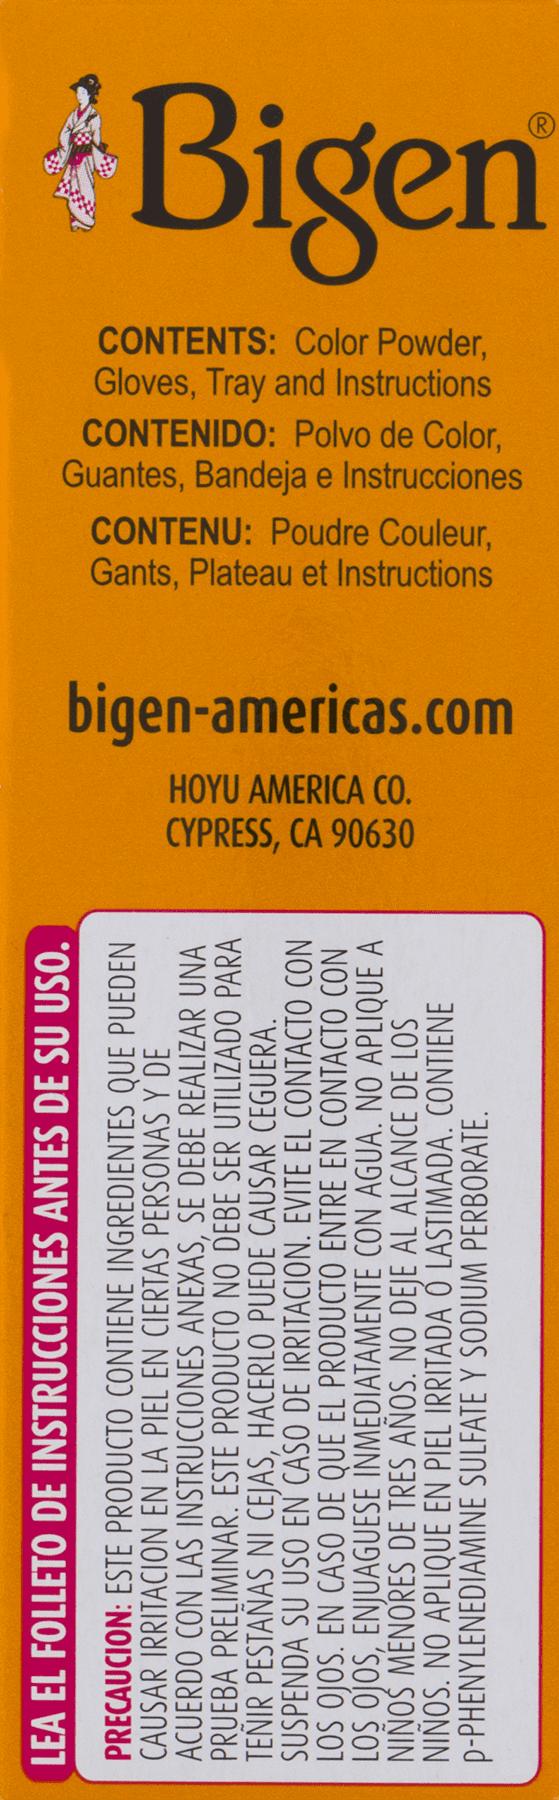 Bigen Permanent Powder Hair Color 11 Oriental Black, 11.11 Oz ...